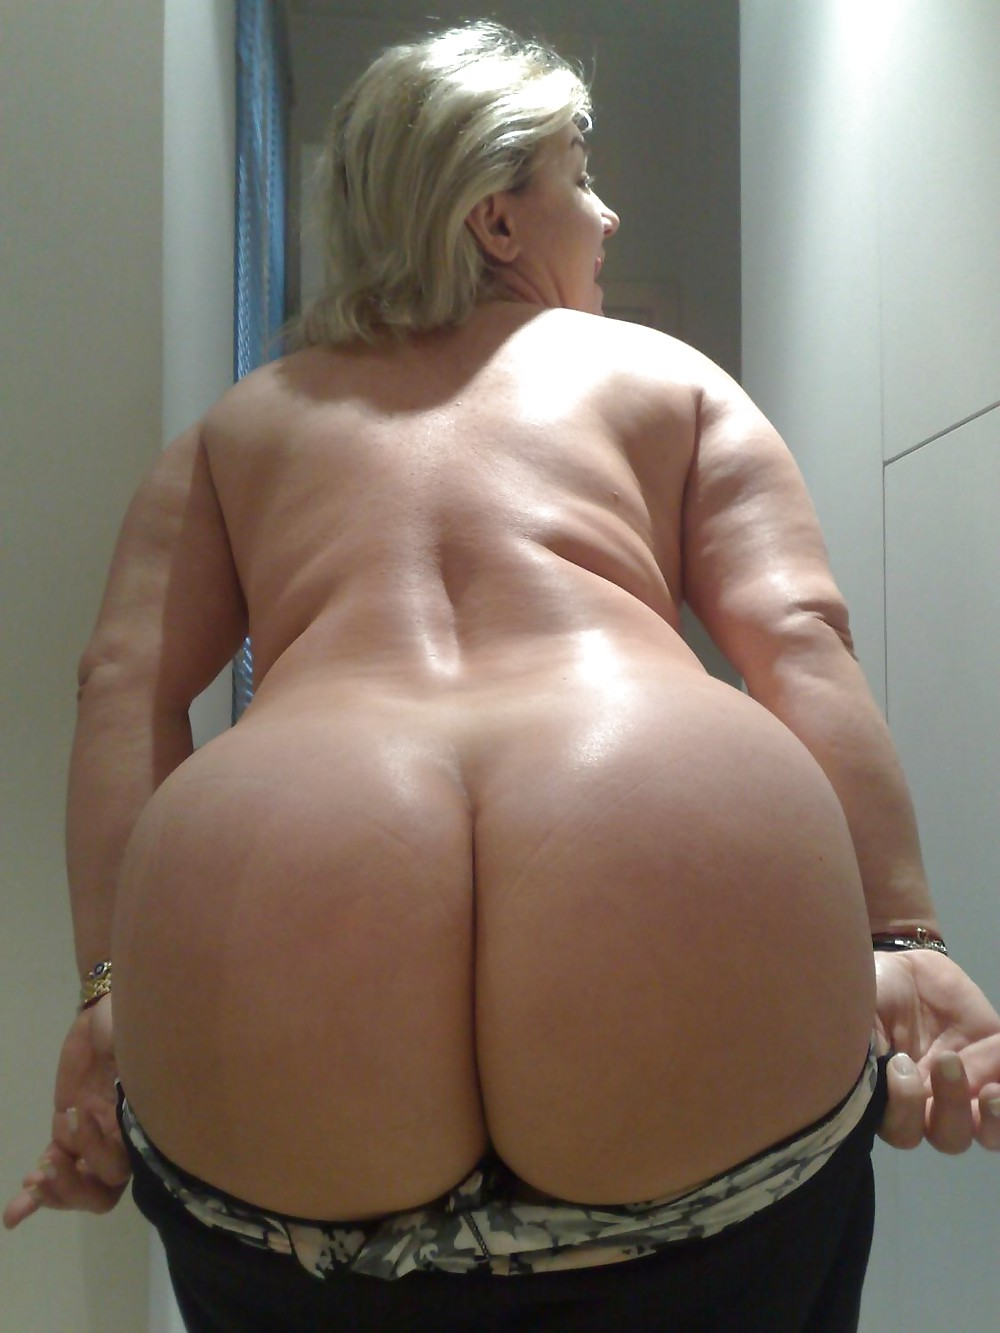 зрелые дамы огромные жопы-цс2